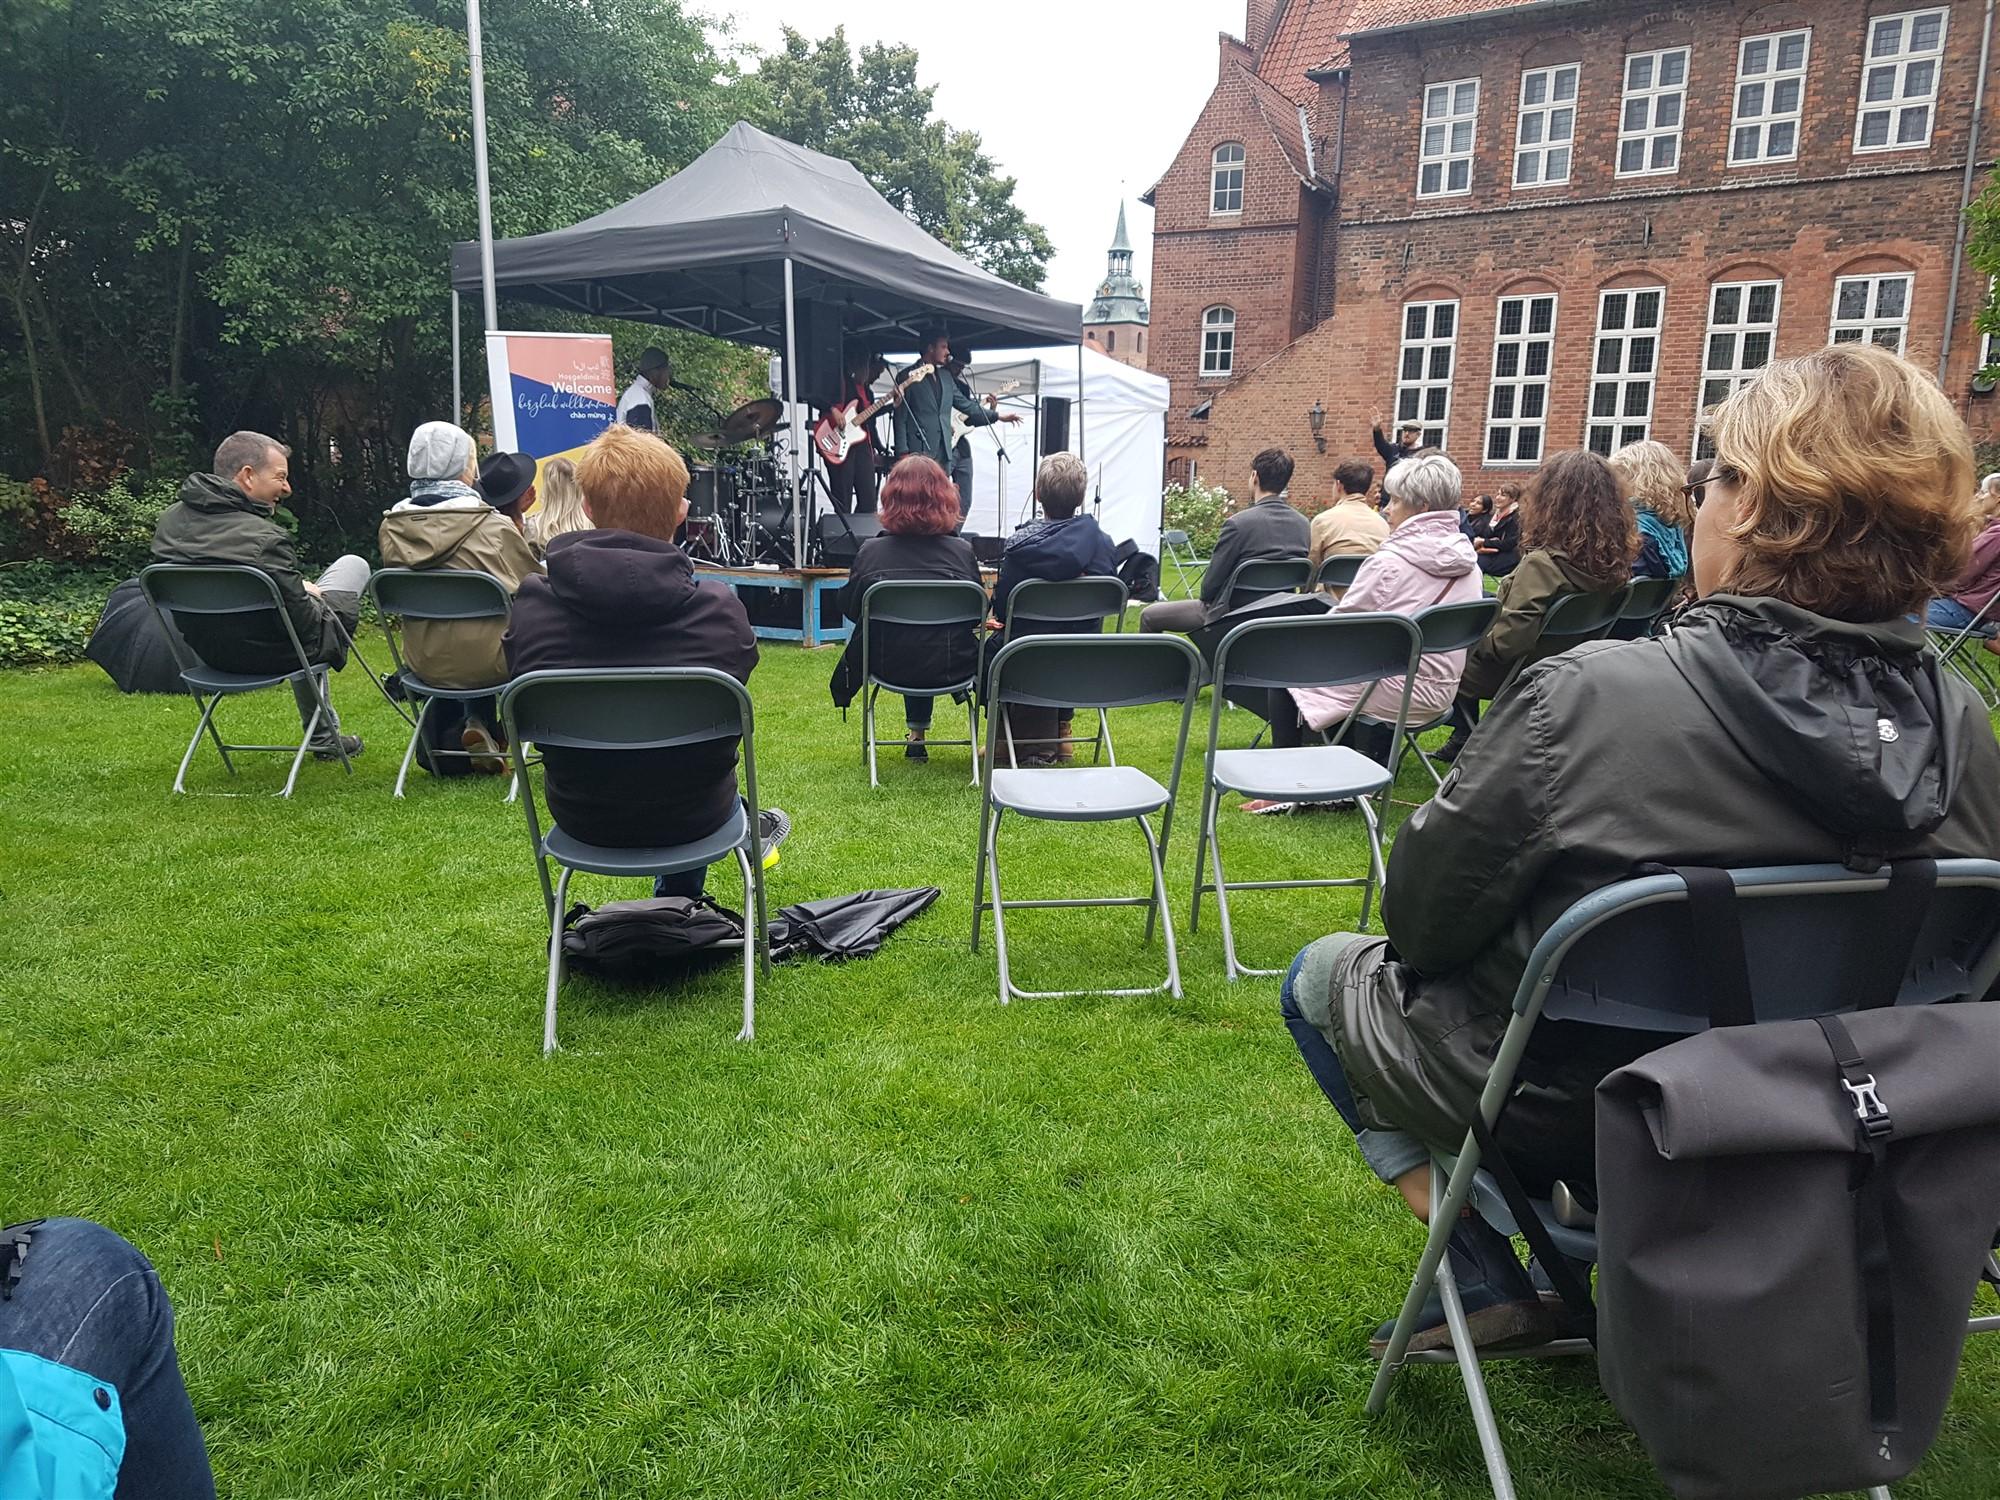 2021-08-28_Rathausgarten-Sommerfestival (14)